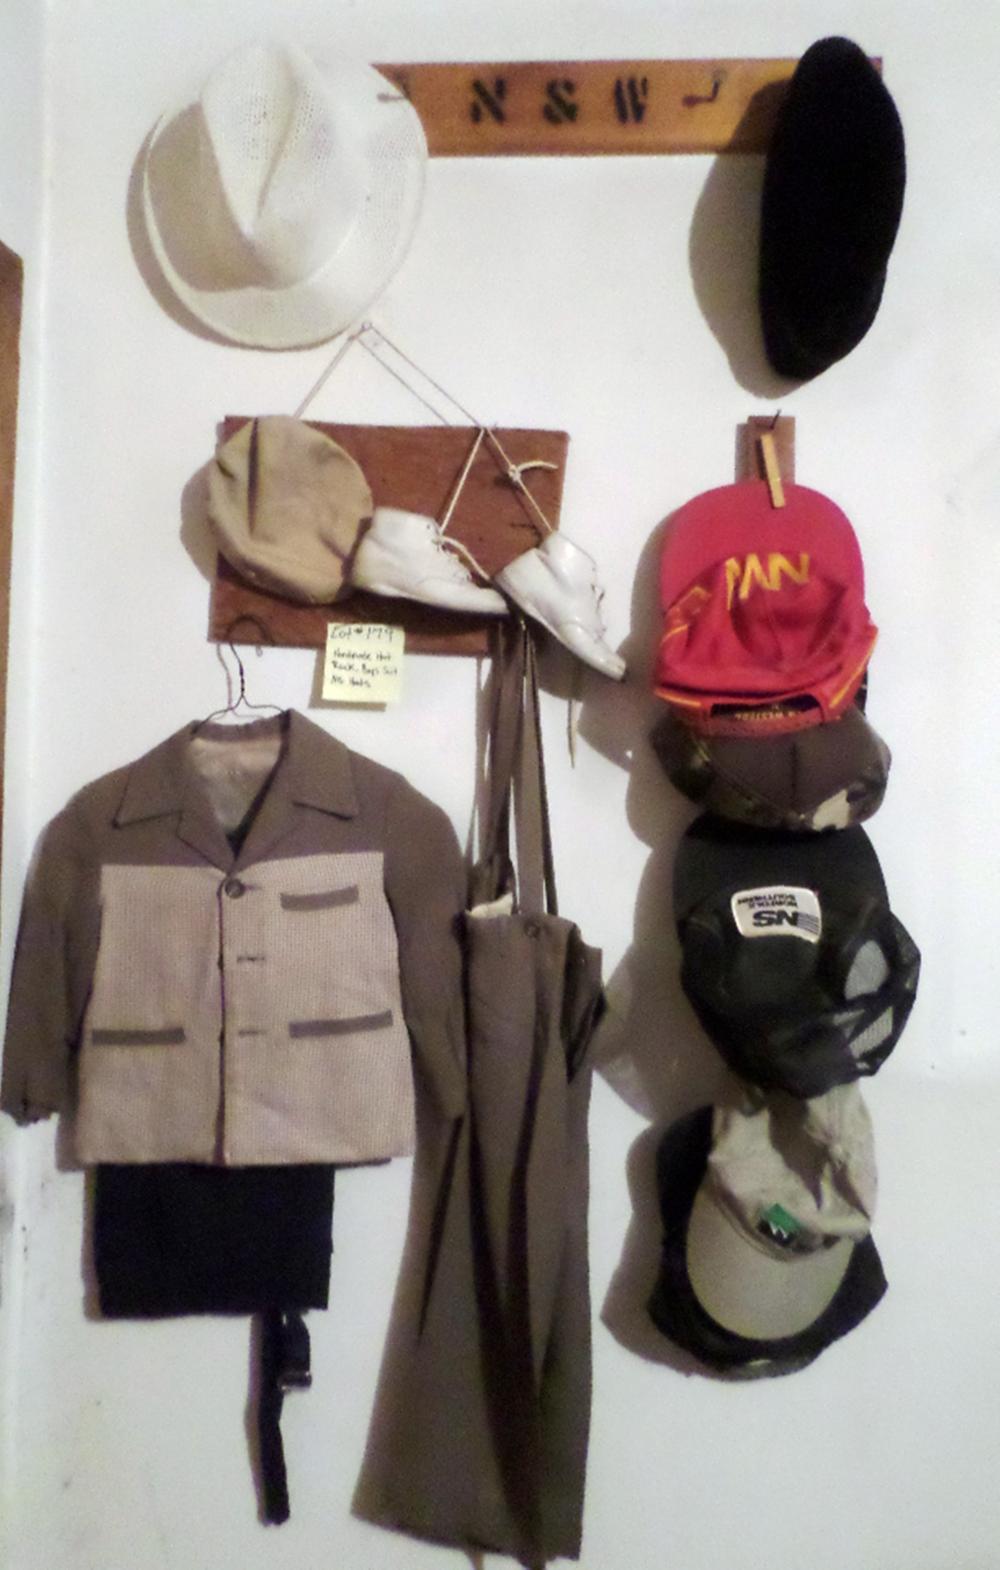 3 Handmade Wood Hat Racks and Boys Suit Set